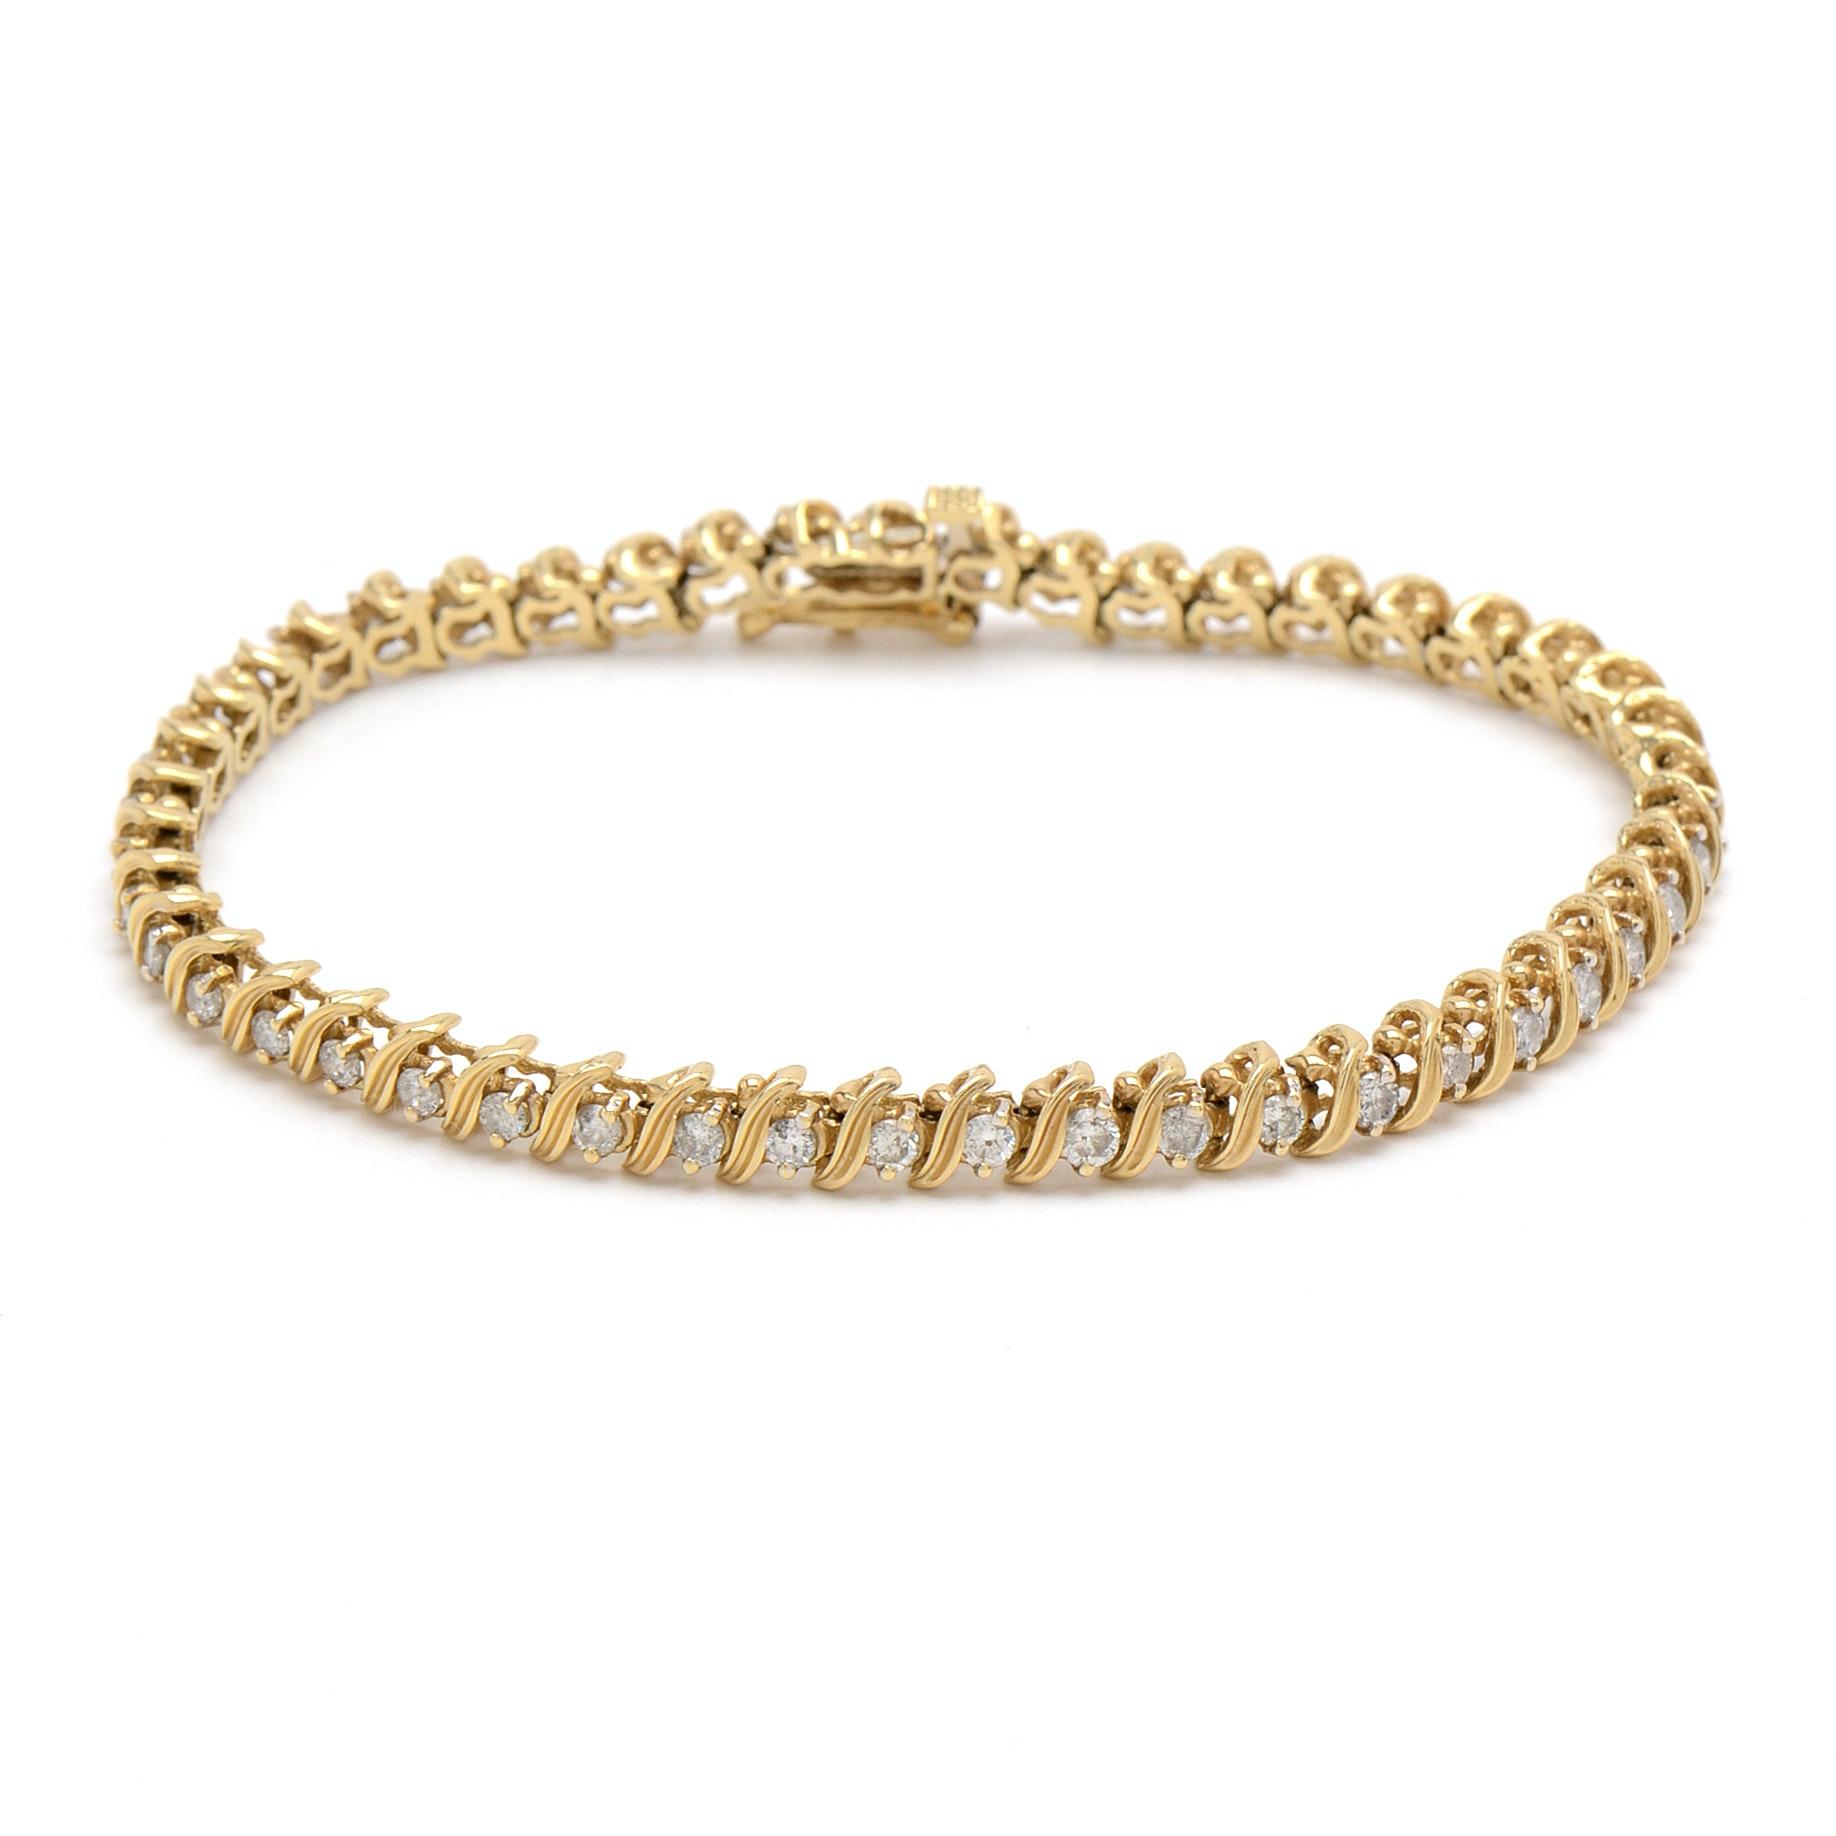 14K Yellow Gold and 1.99 CTW Diamond Tennis Bracelet